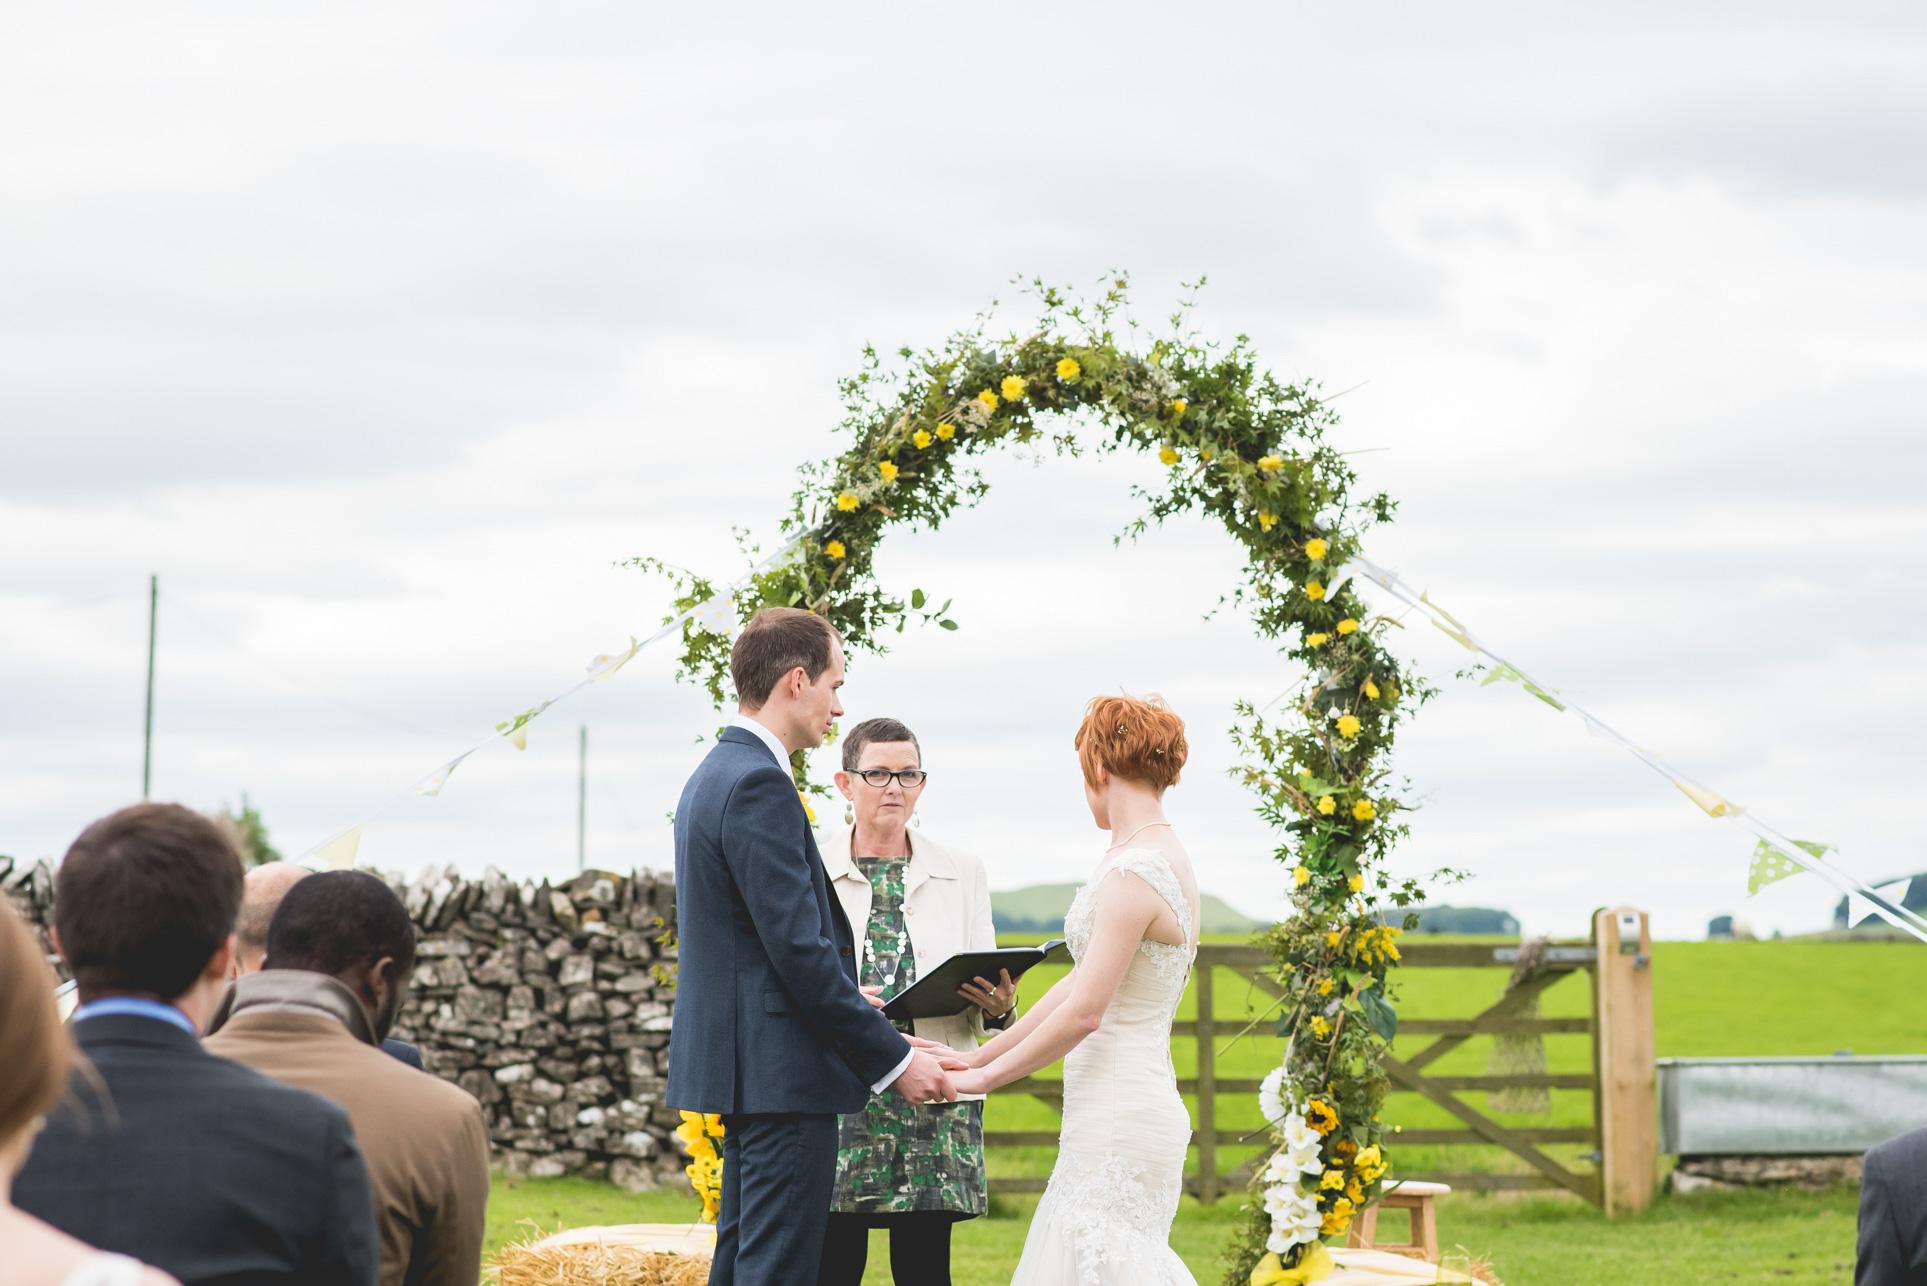 Peak+district+farm+wedding+lower+damgate+photographer-126.jpg